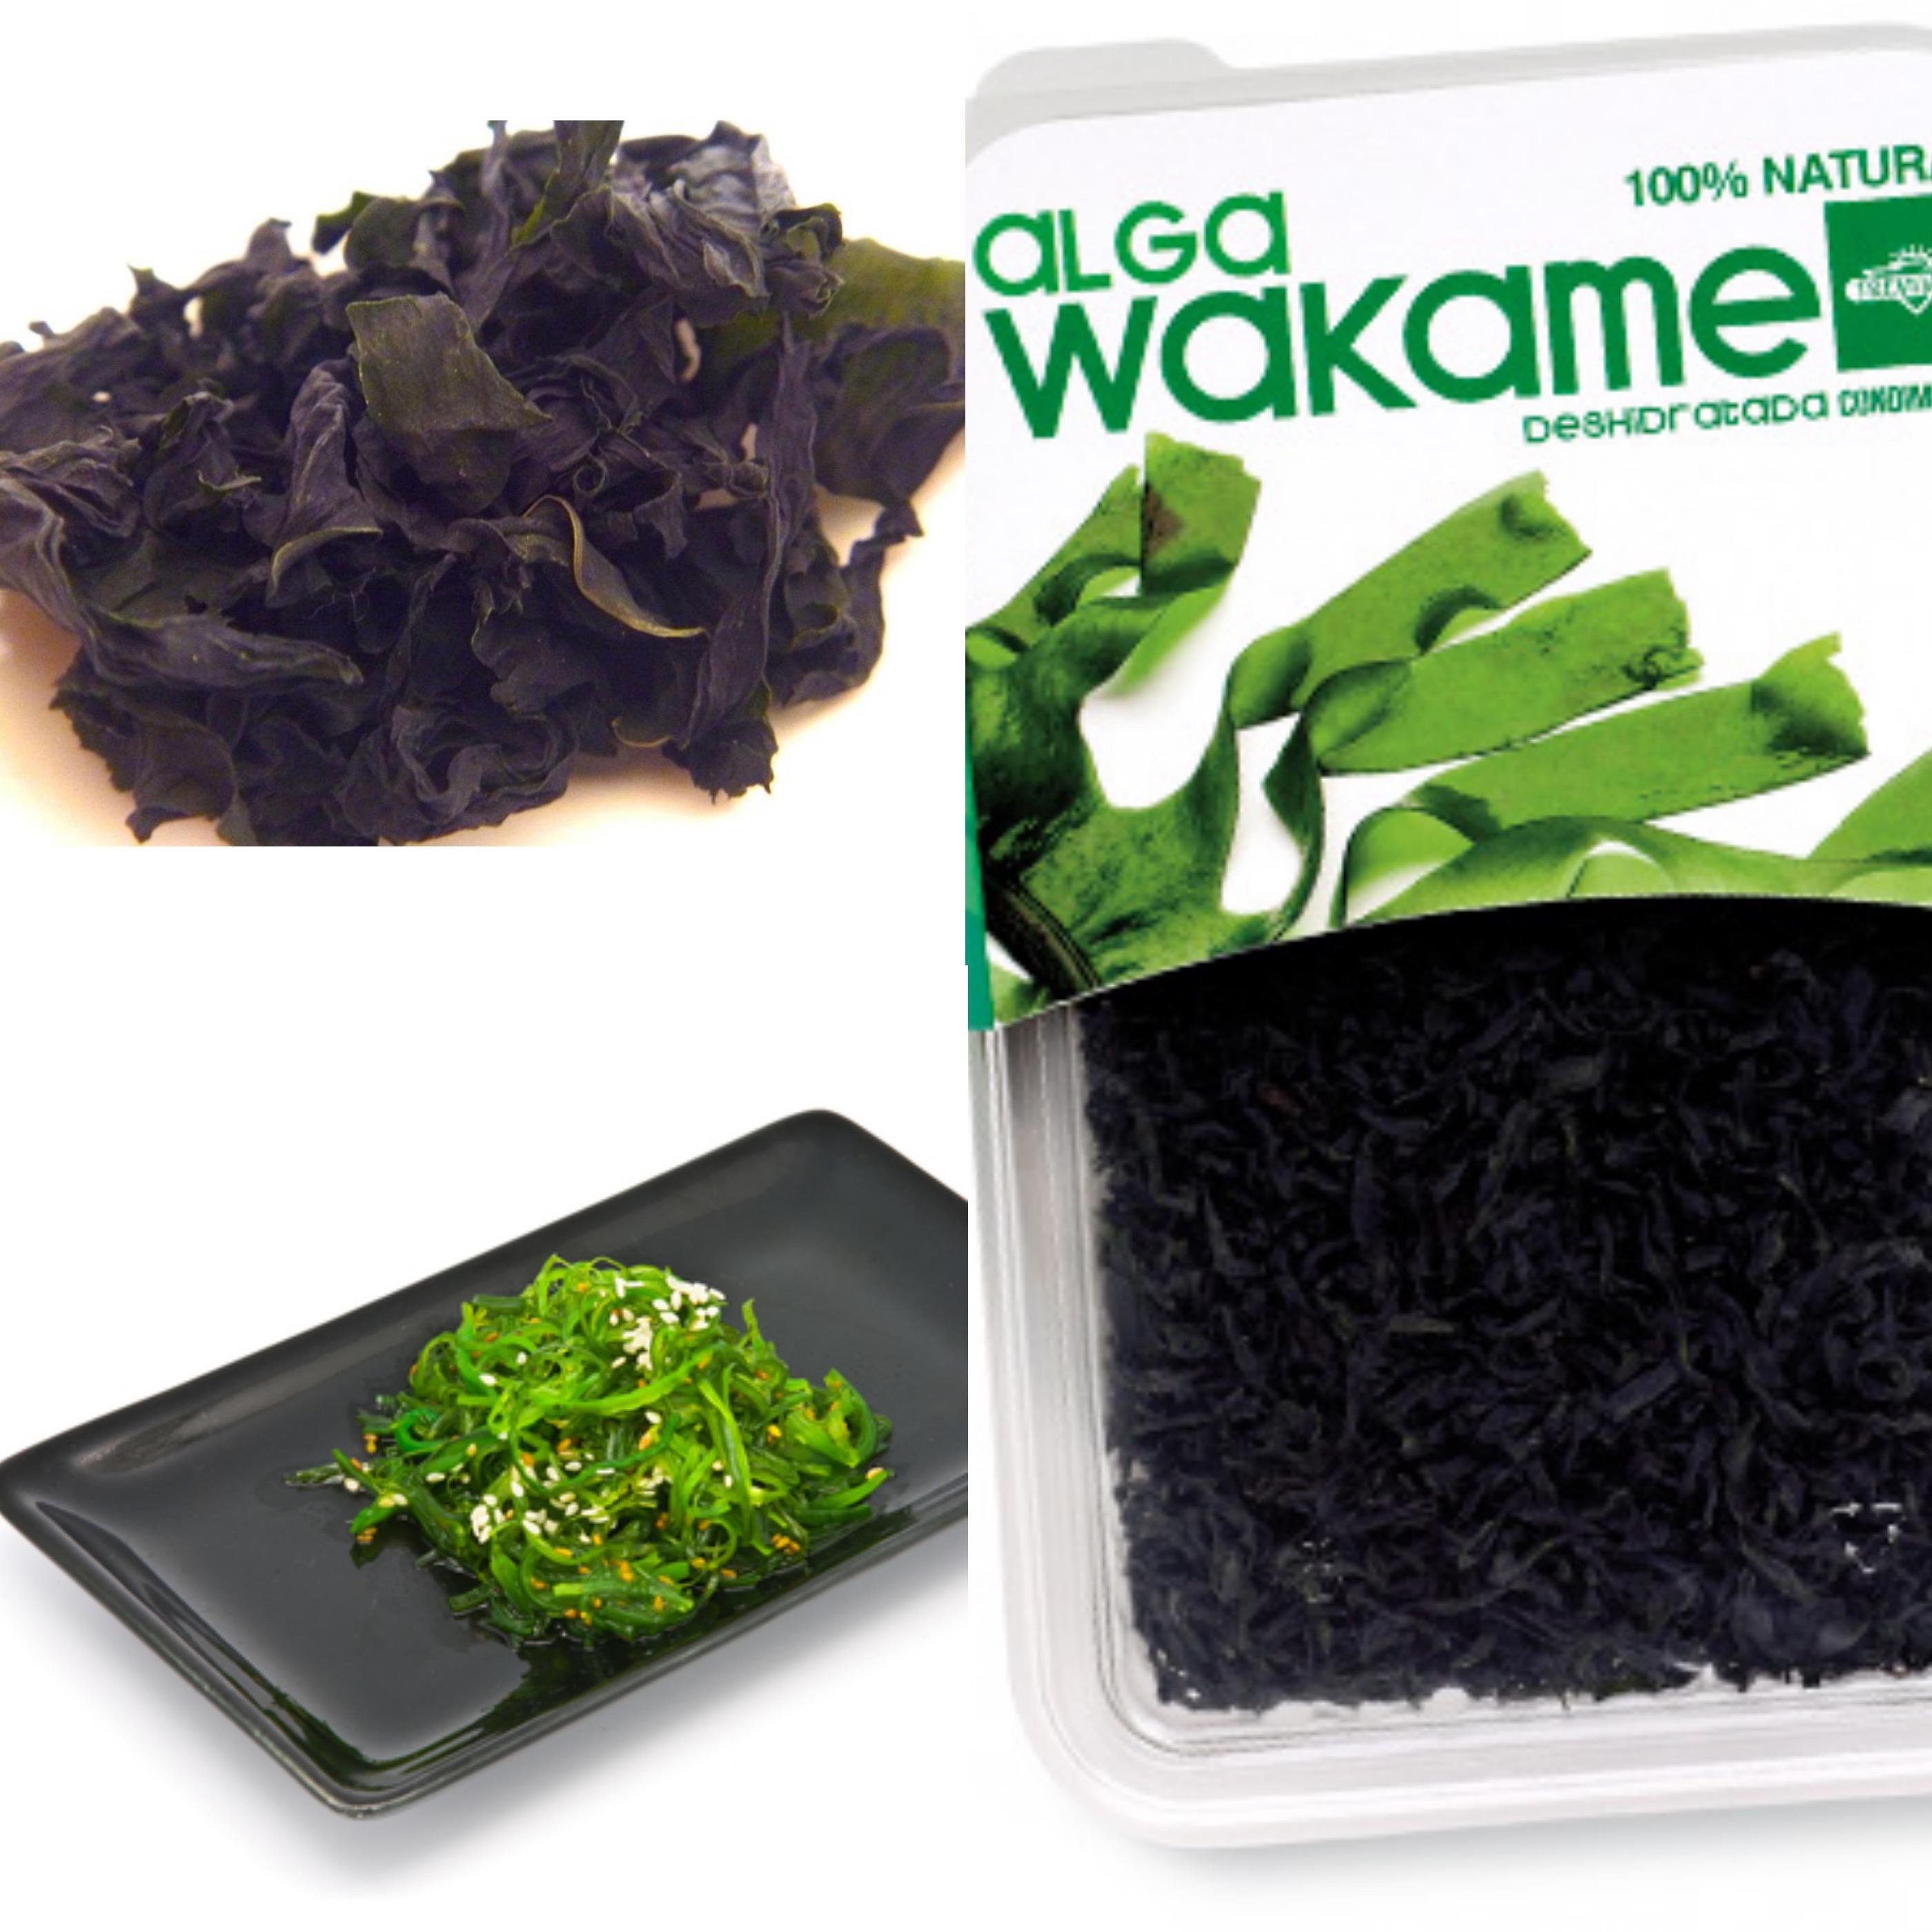 Alghe wakame per dimagrire